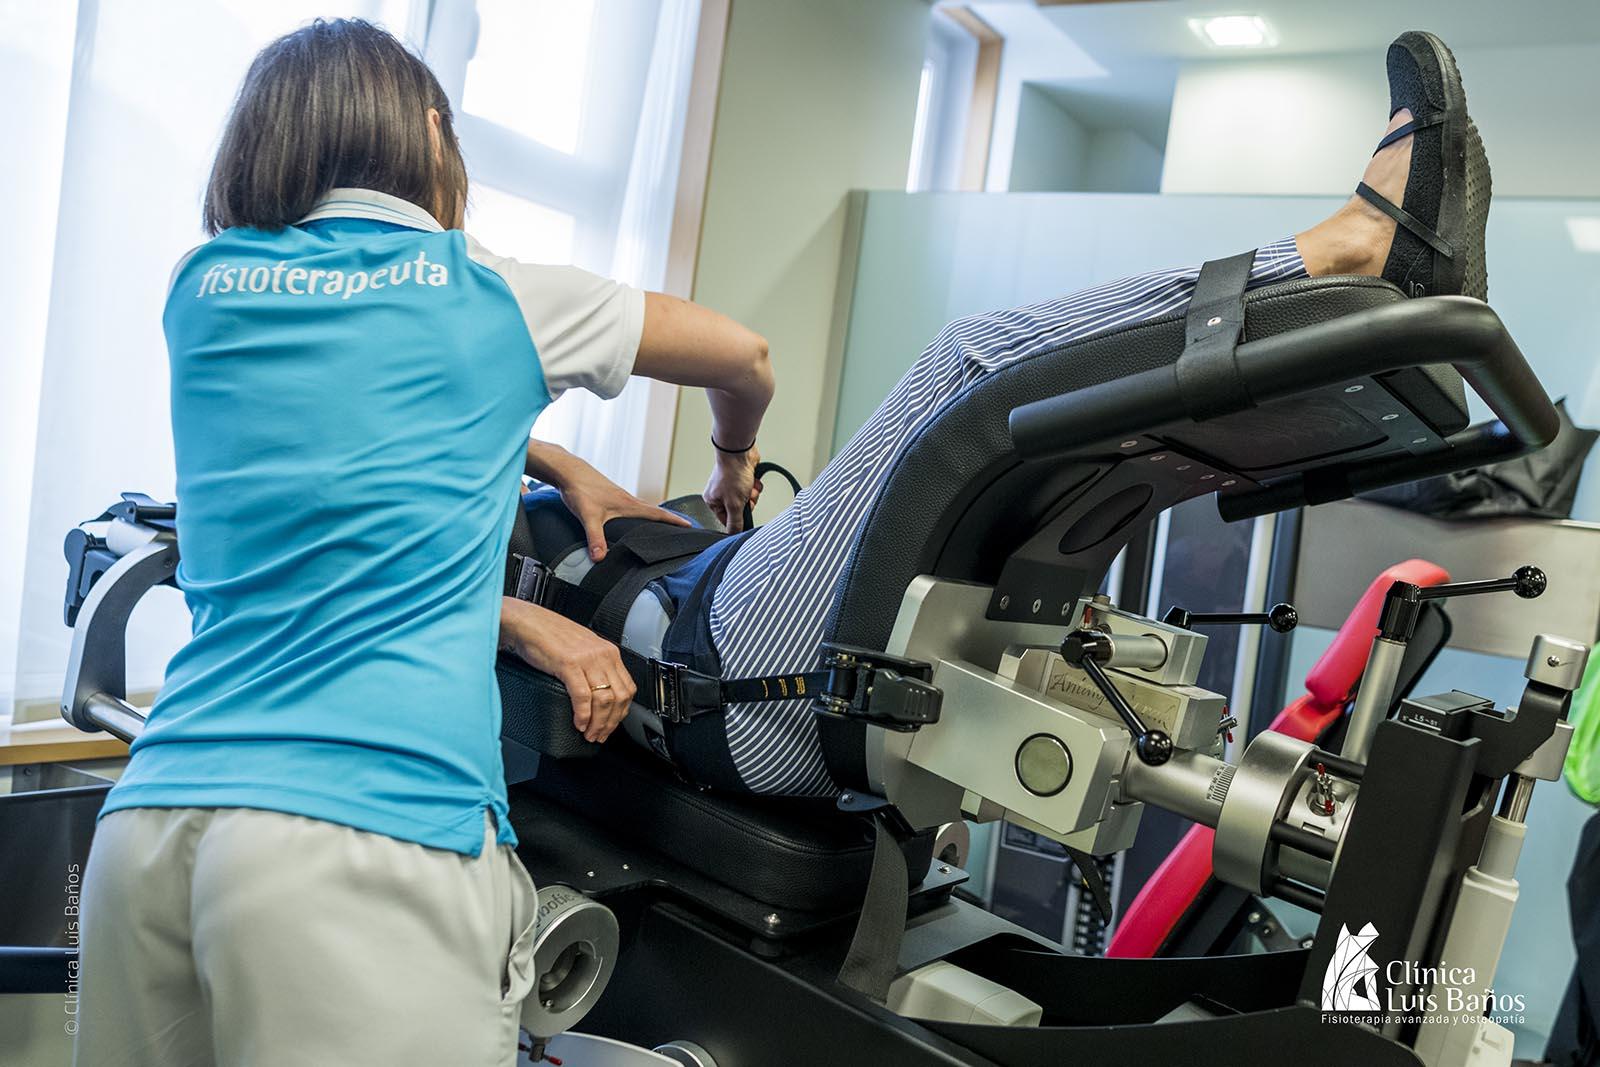 Tratamiento de hernia de disco con tecnología de Descompresión 3D